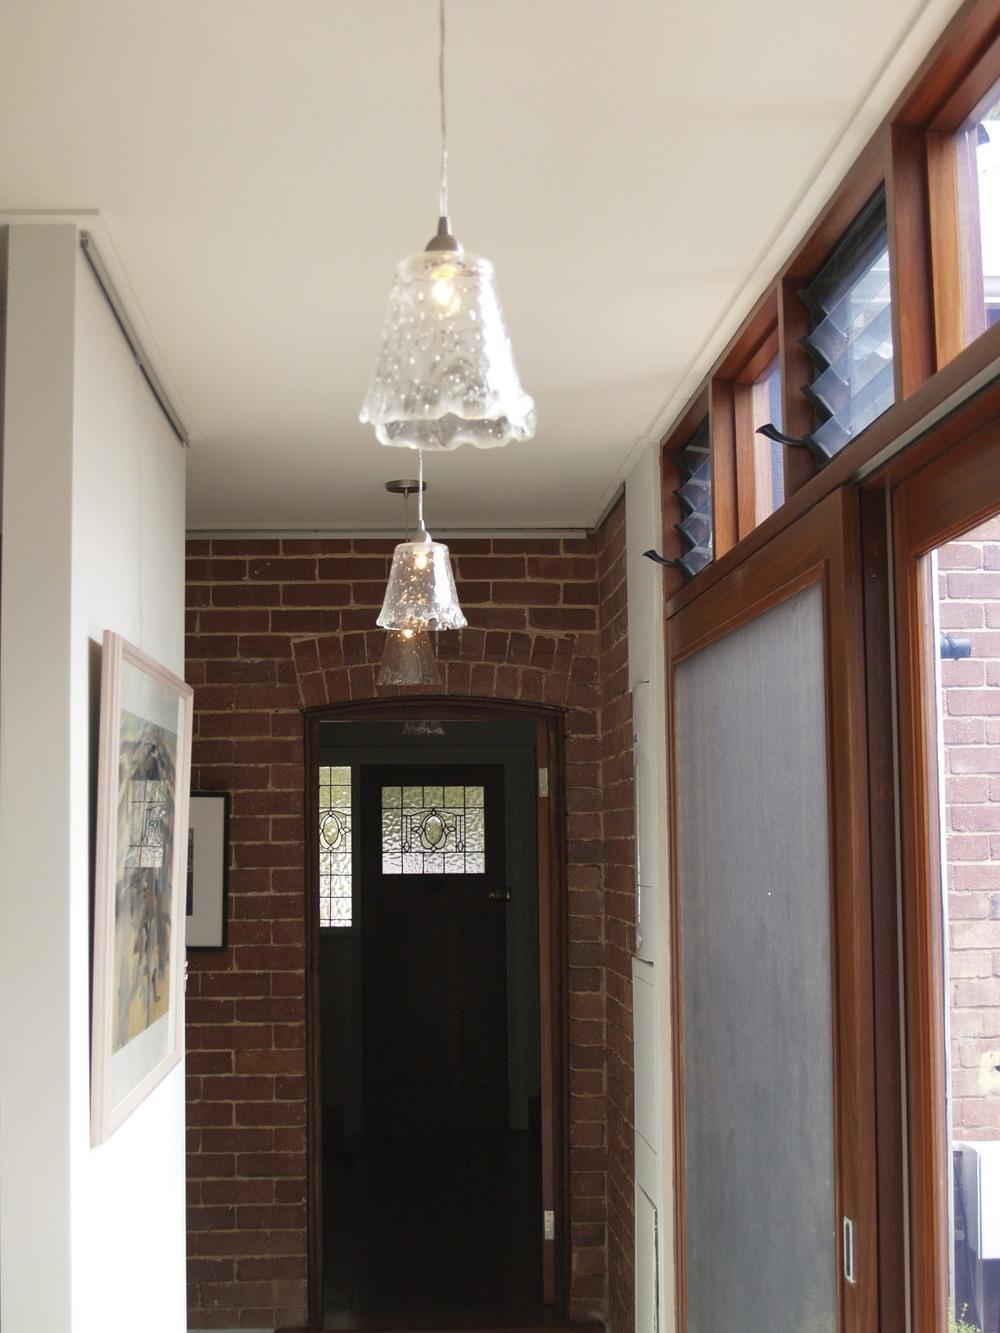 Hanging lights down the hallway